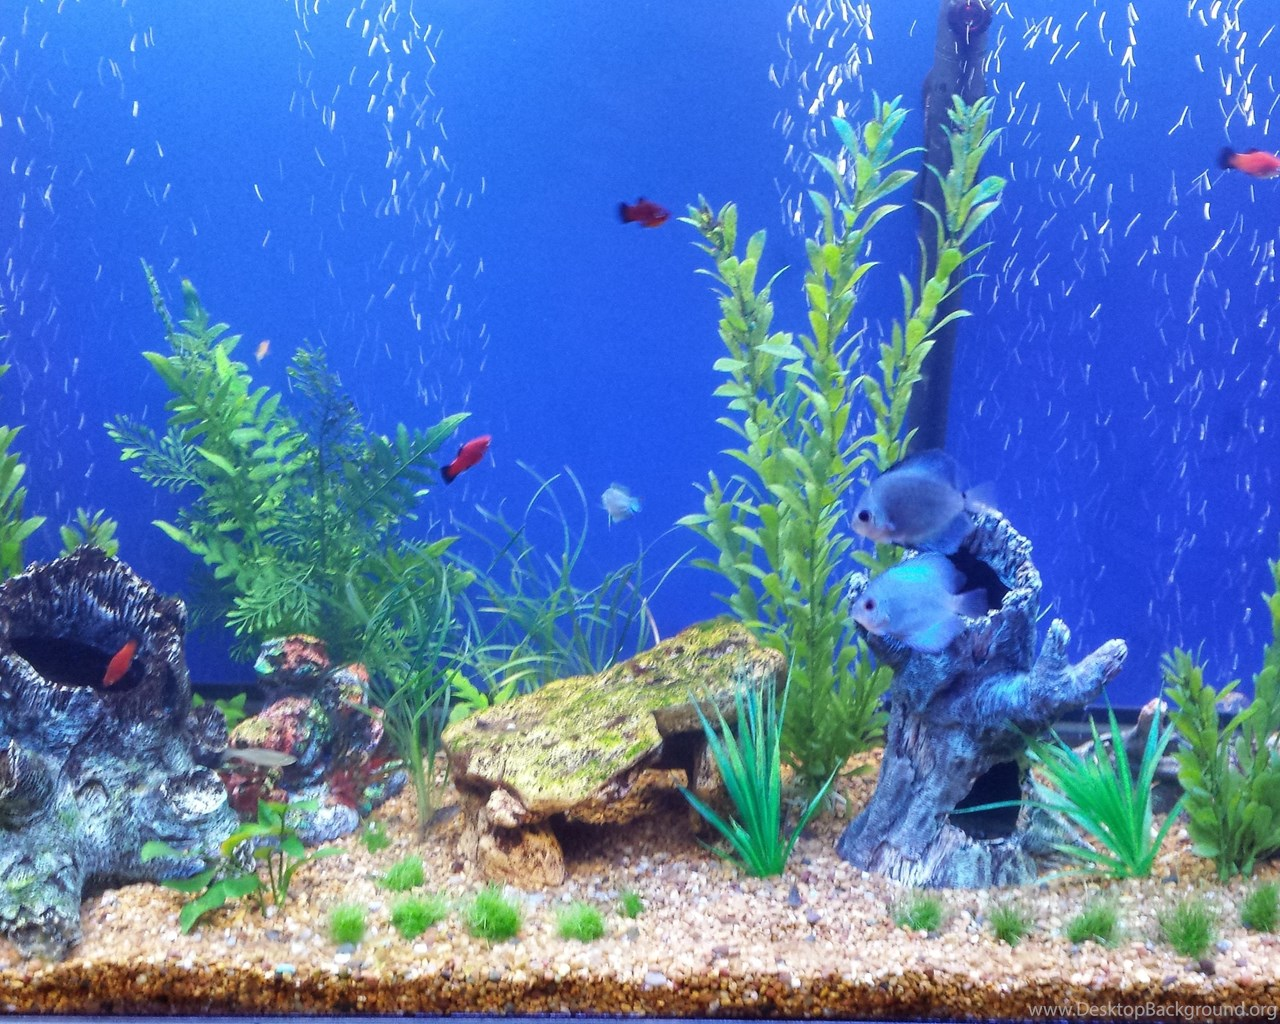 Concept Design Home Fish Tank Backgrounds Pictures Desktop Background